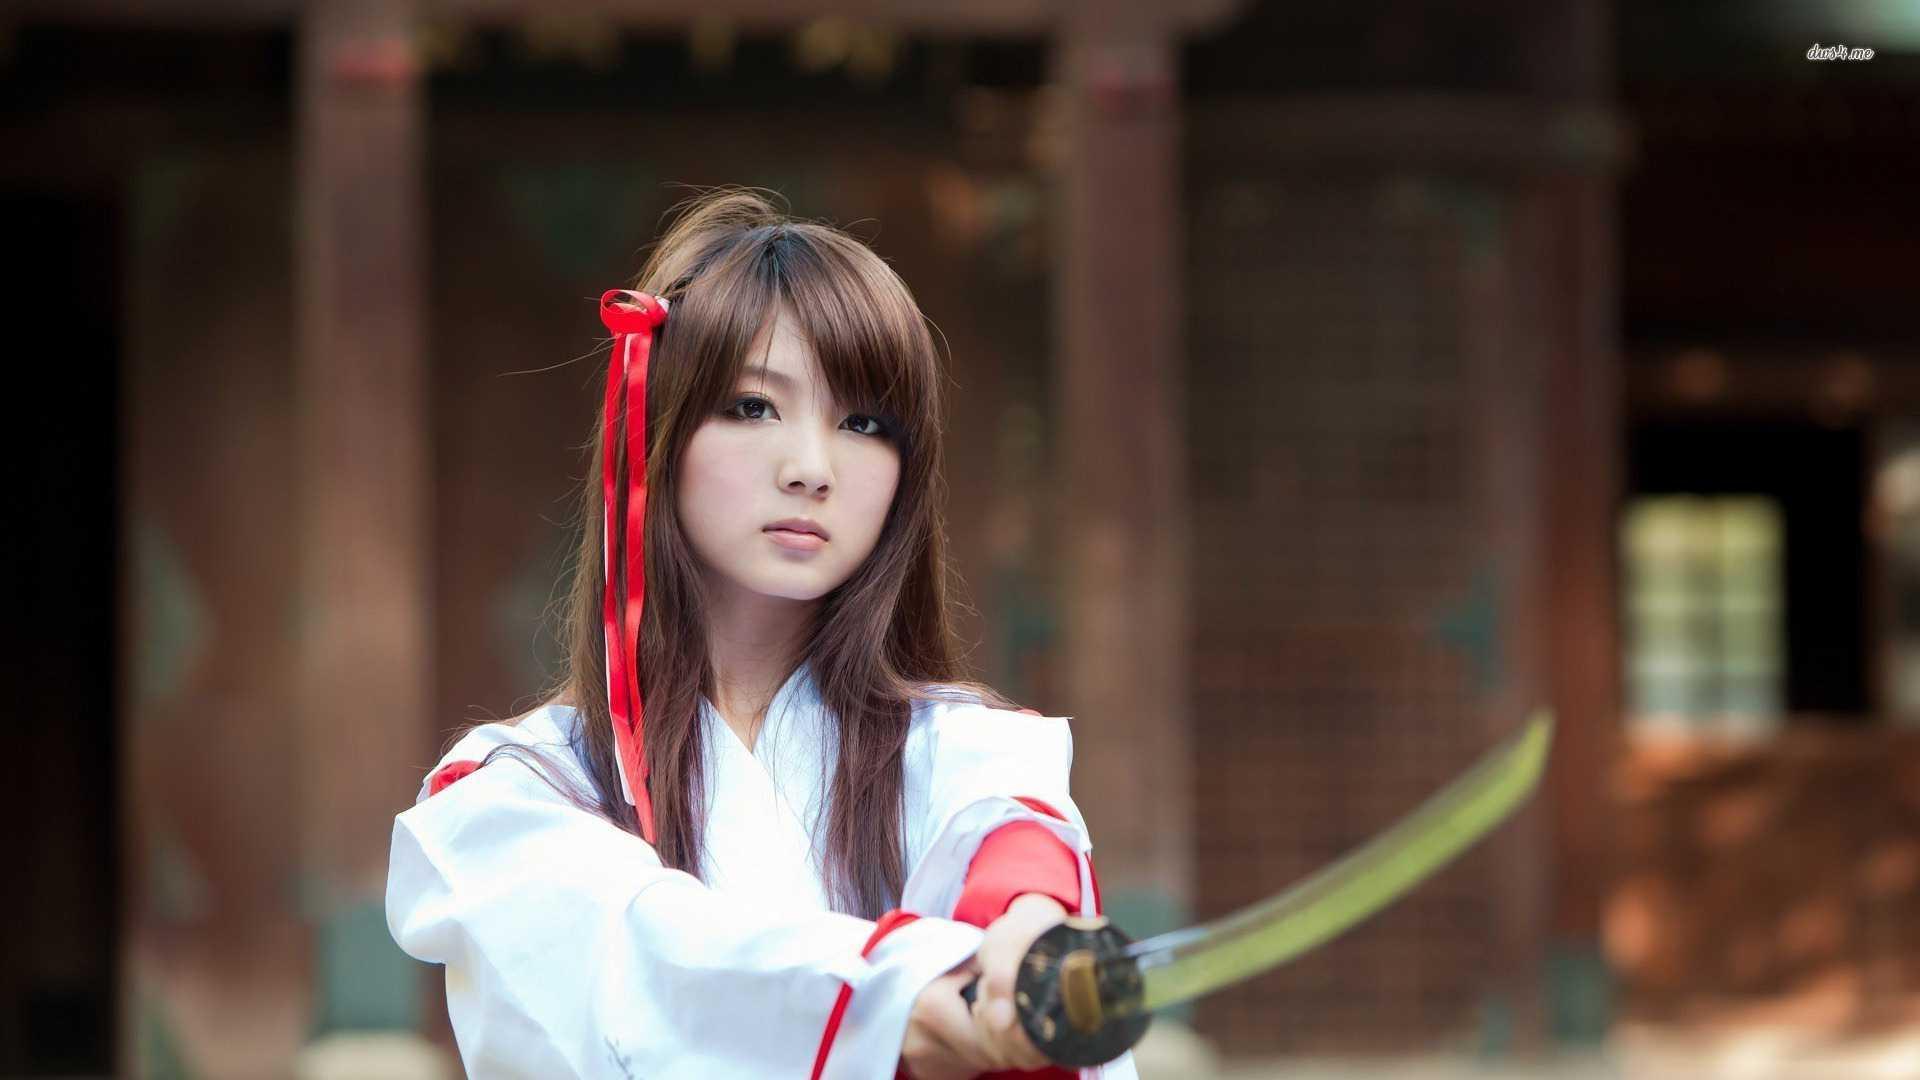 Japanese Samurai Girl Wallpapers Top Free Japanese Samurai Girl